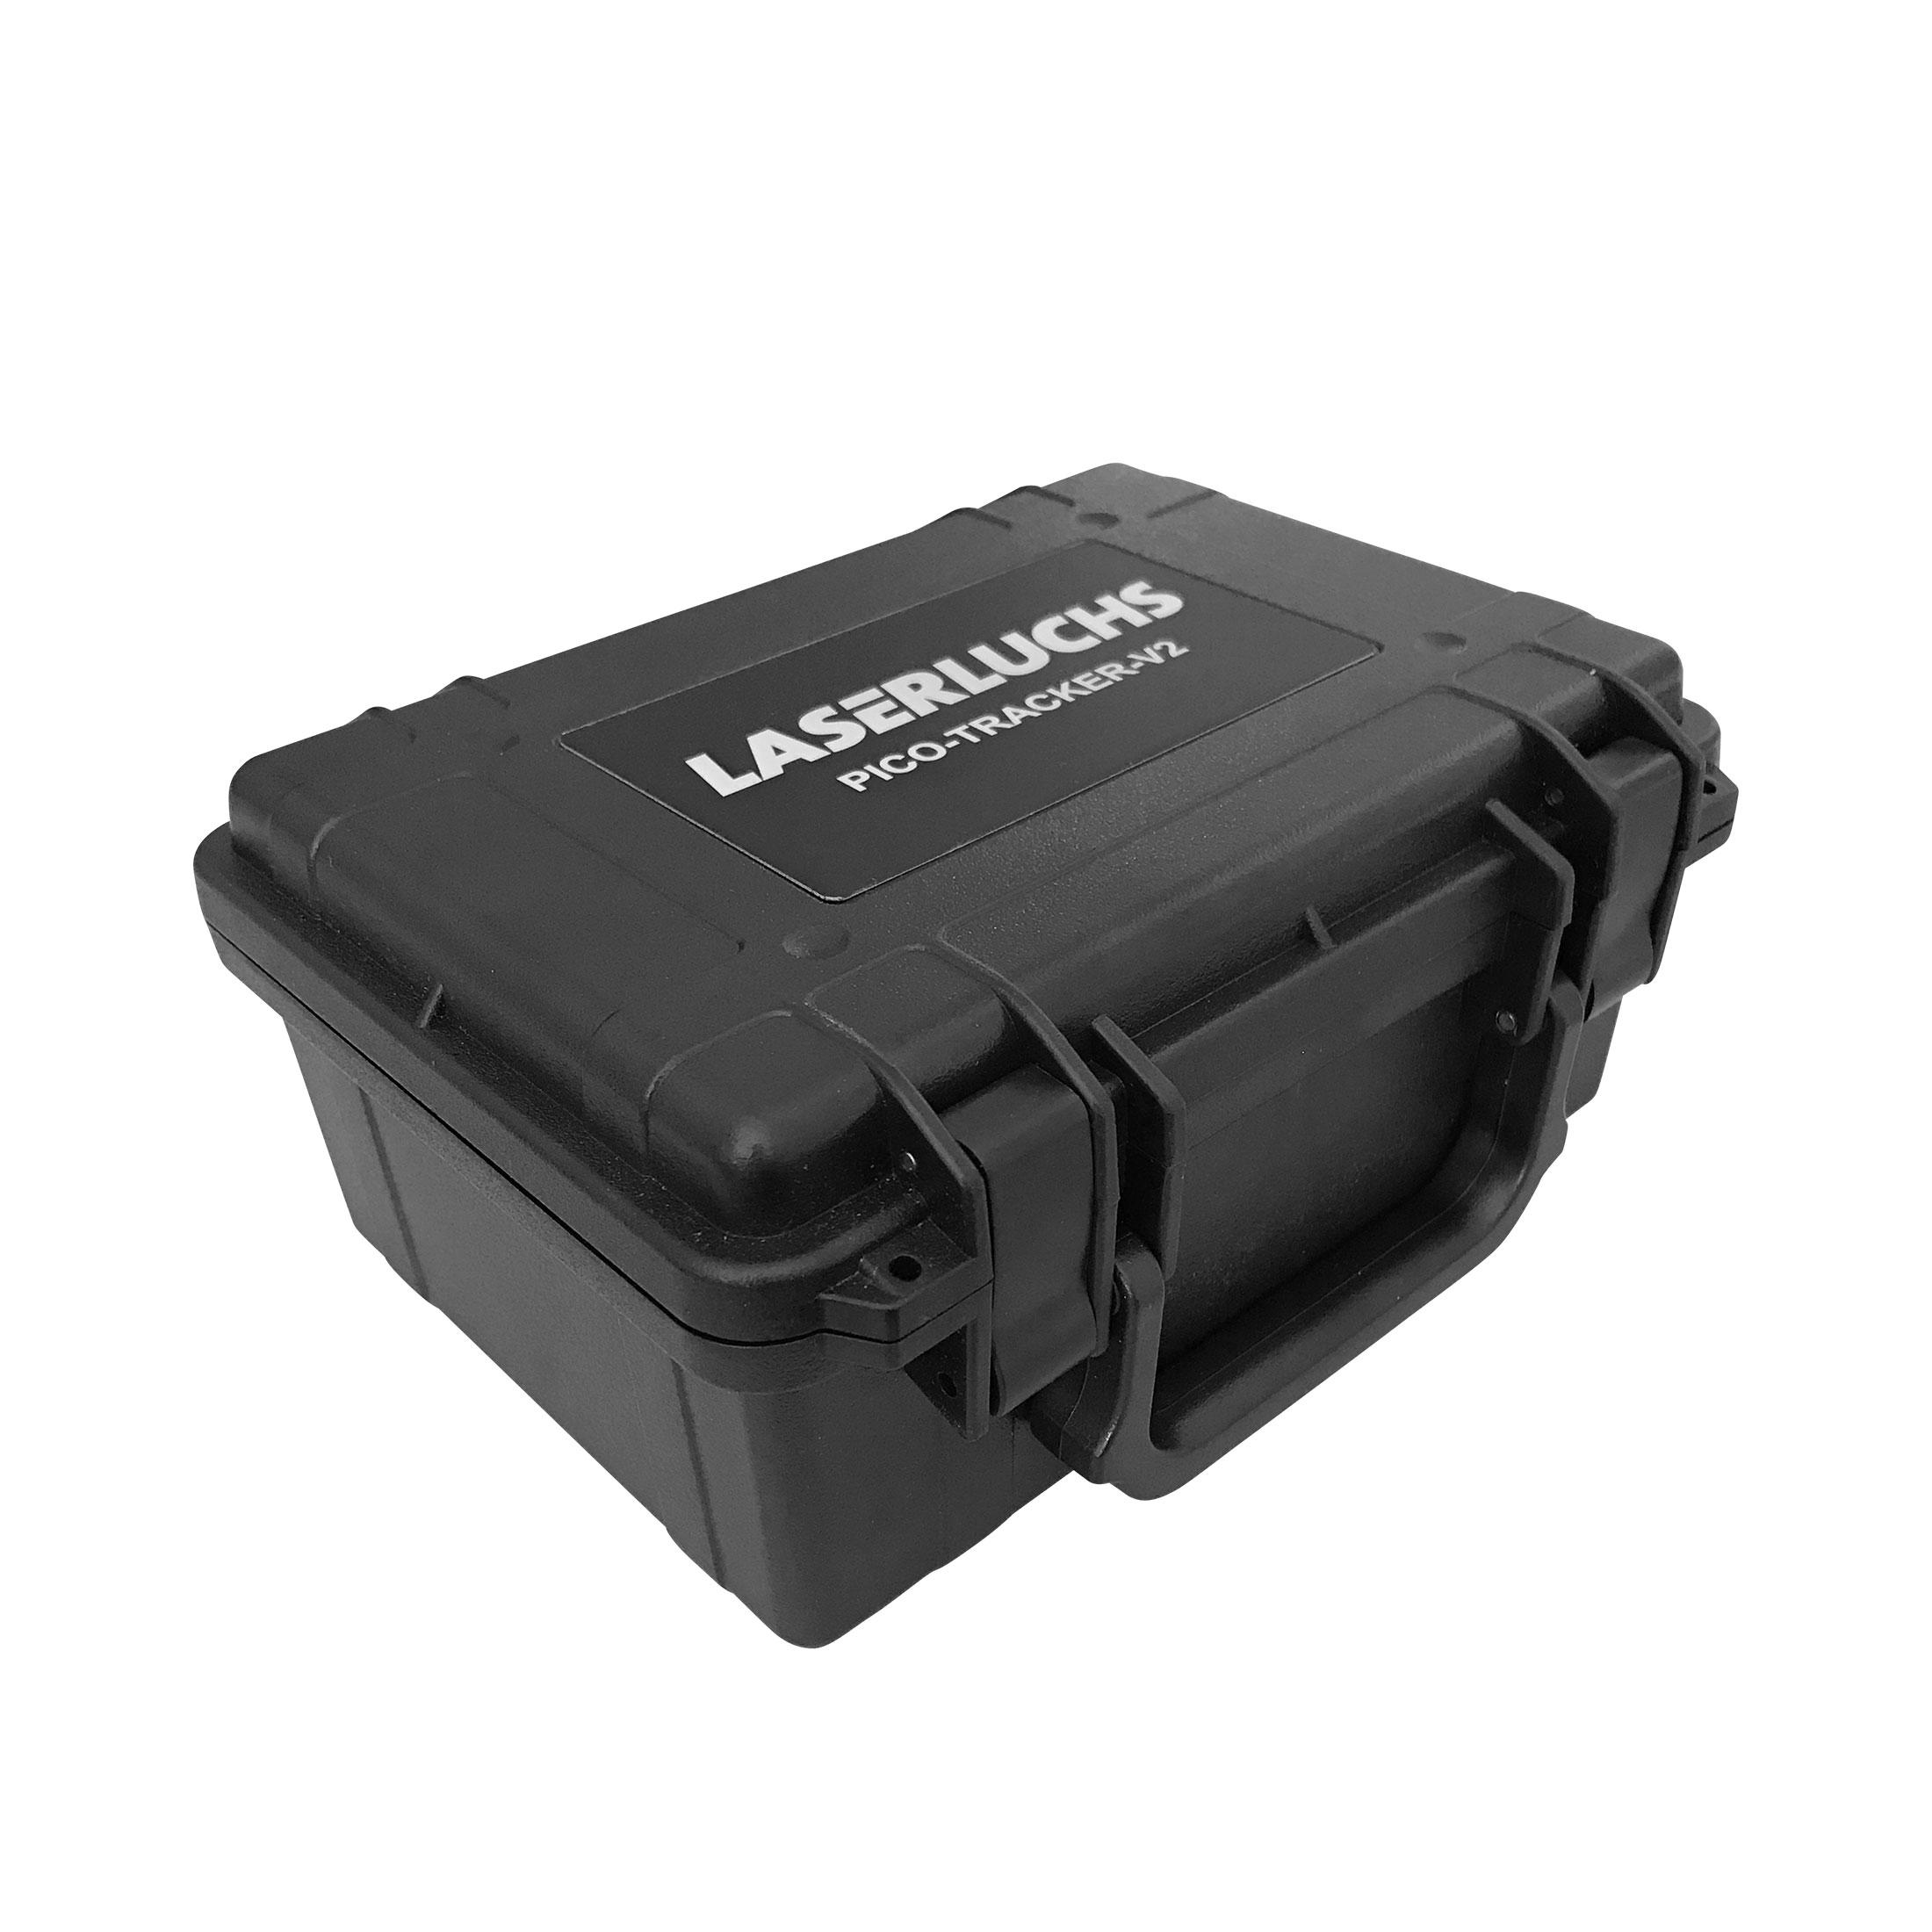 Laserluchs Tactical PICO-TRACKER-V2